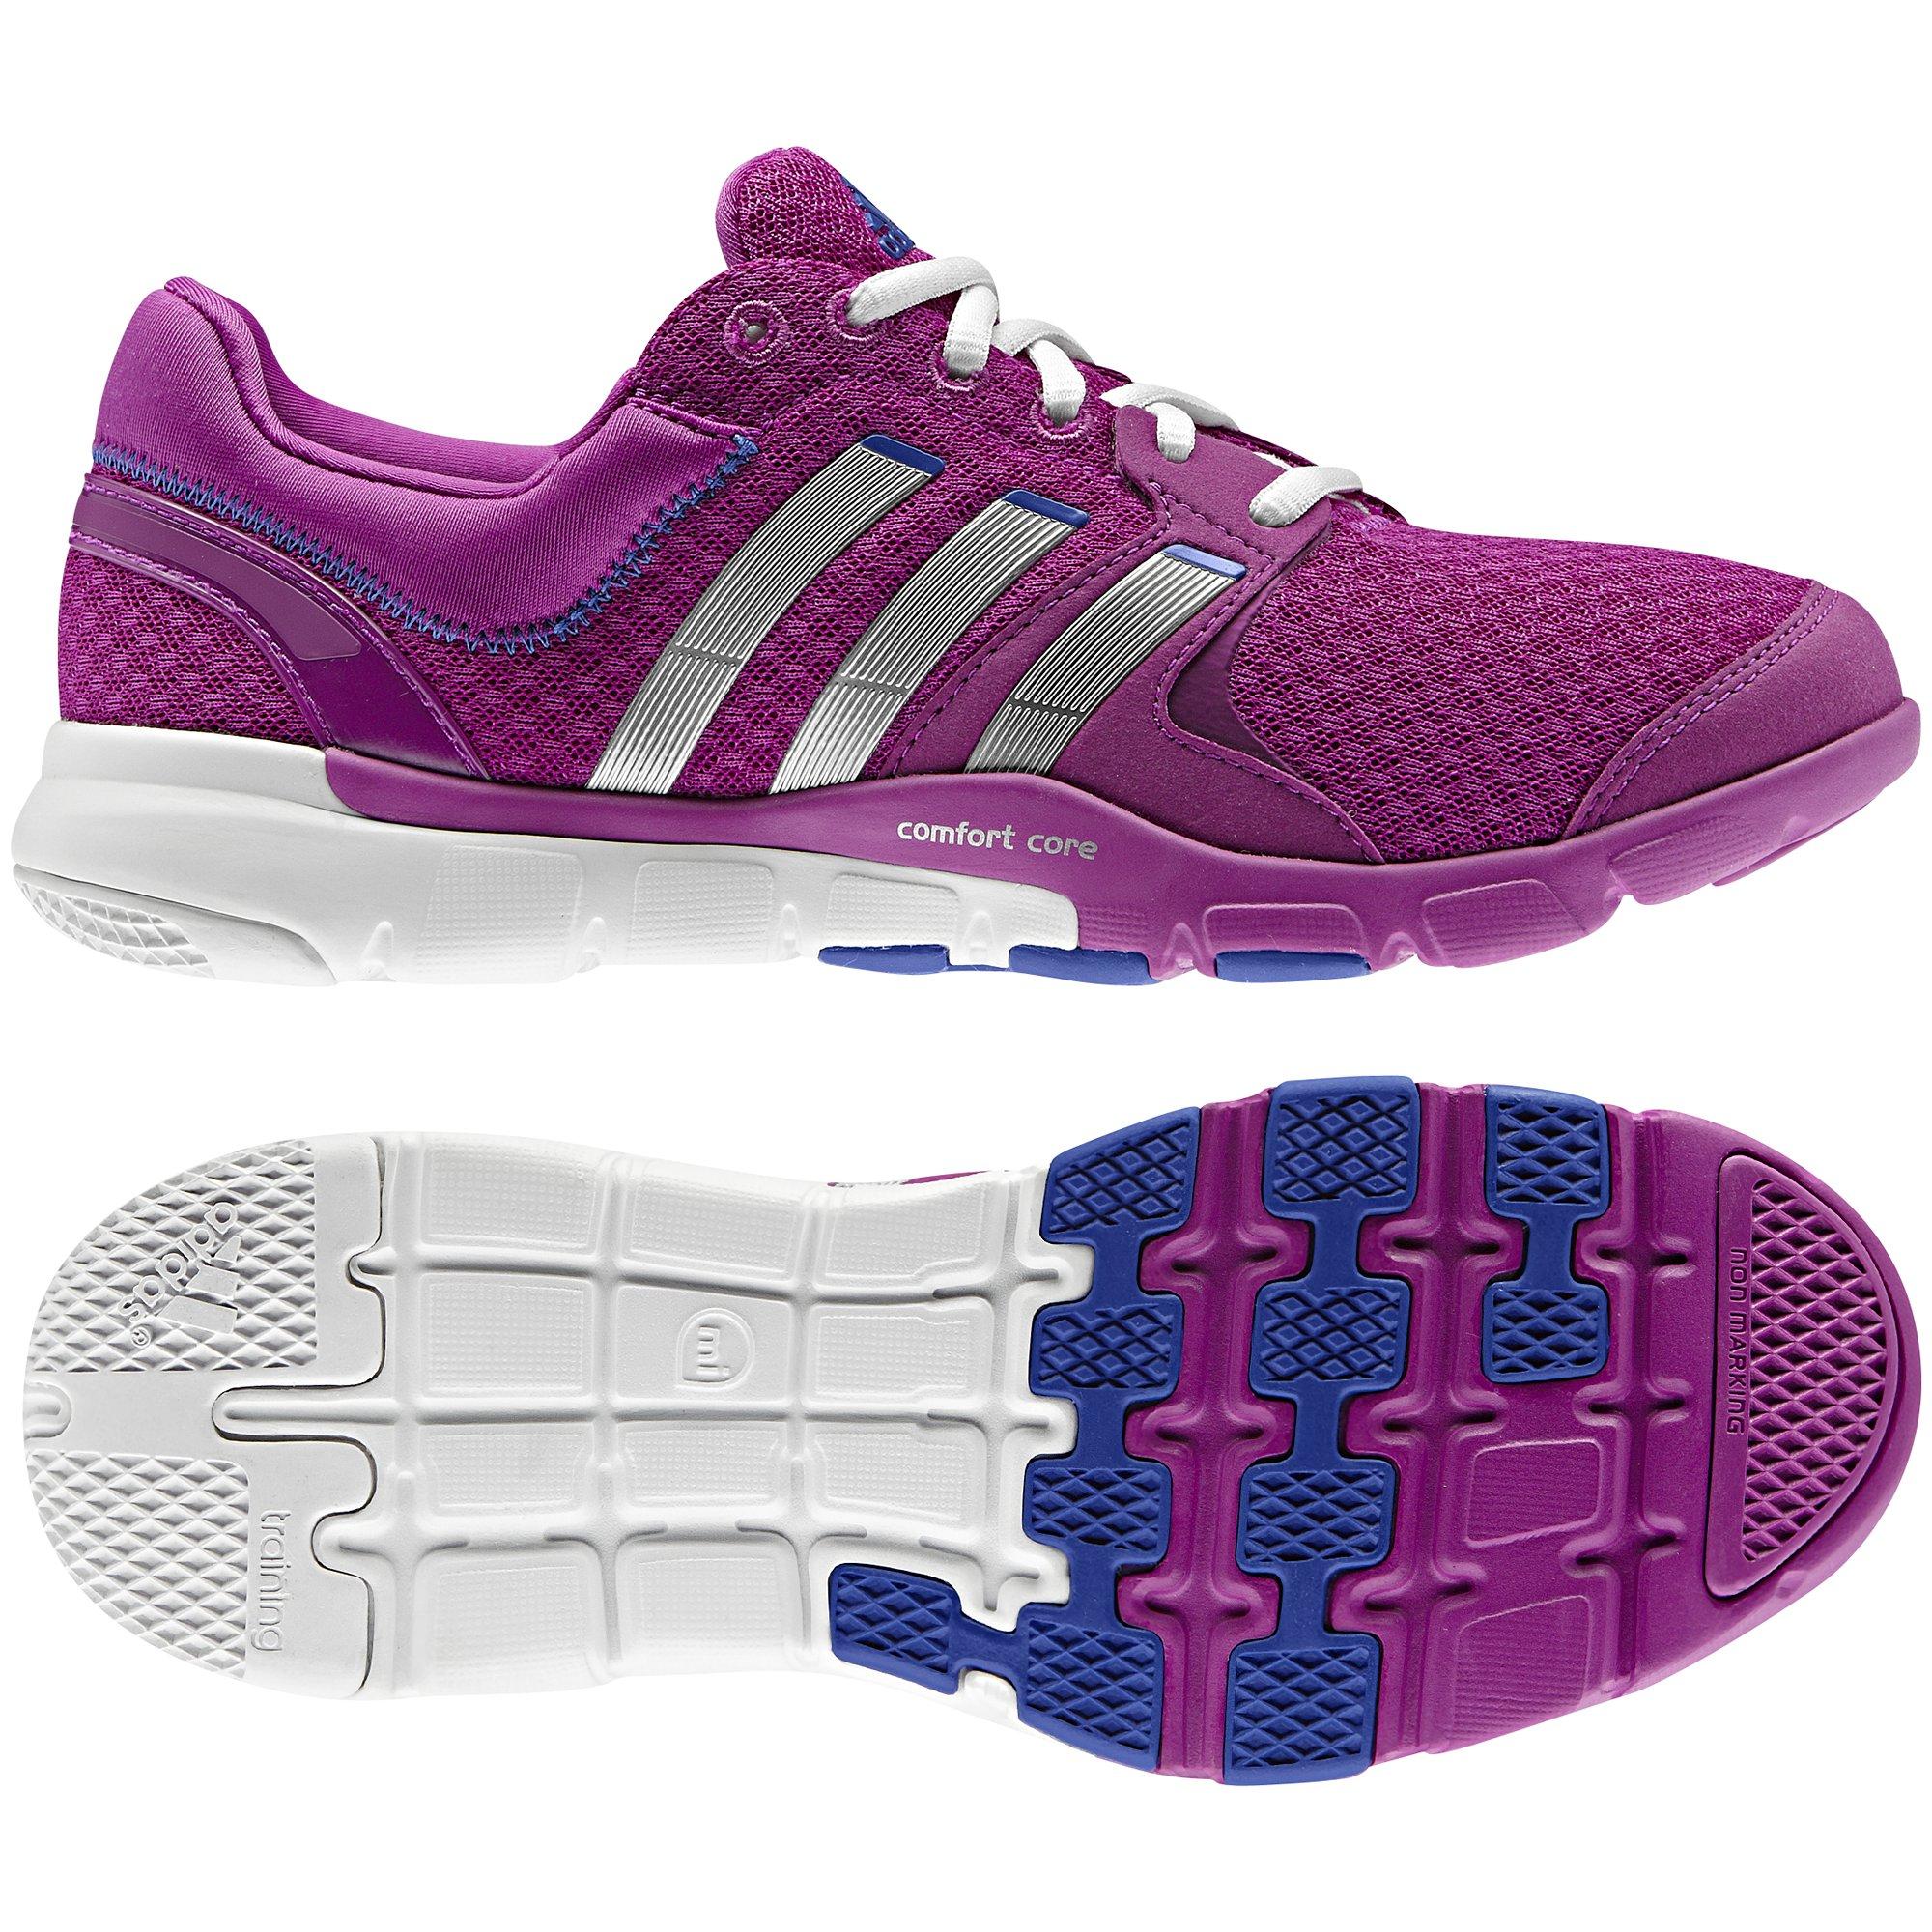 Damen Fitness Schuh Adipure Trainer 270 2D